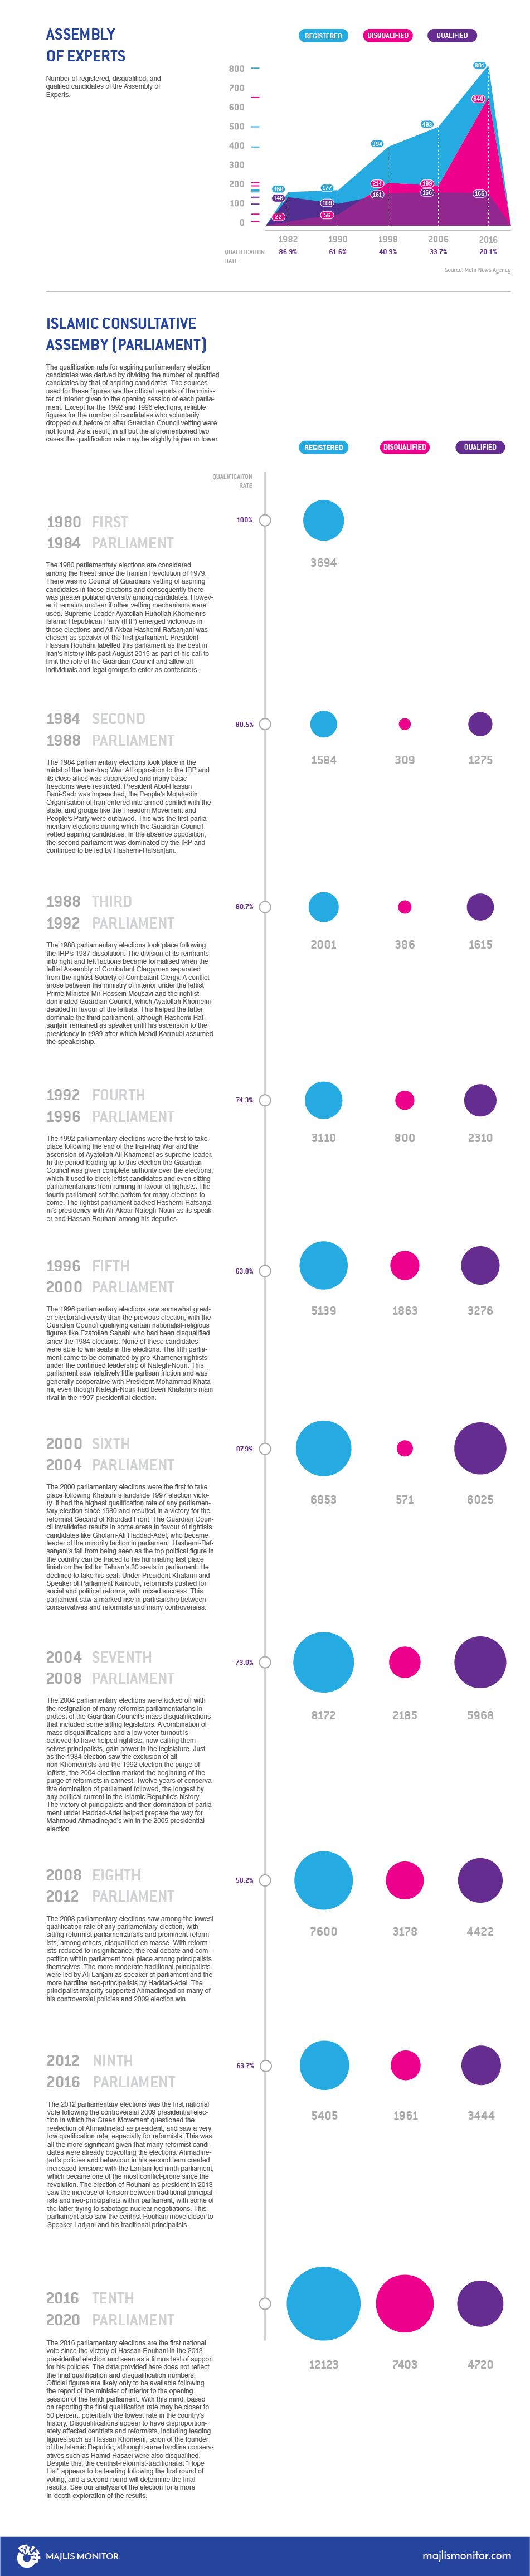 Qualification Infographic-02